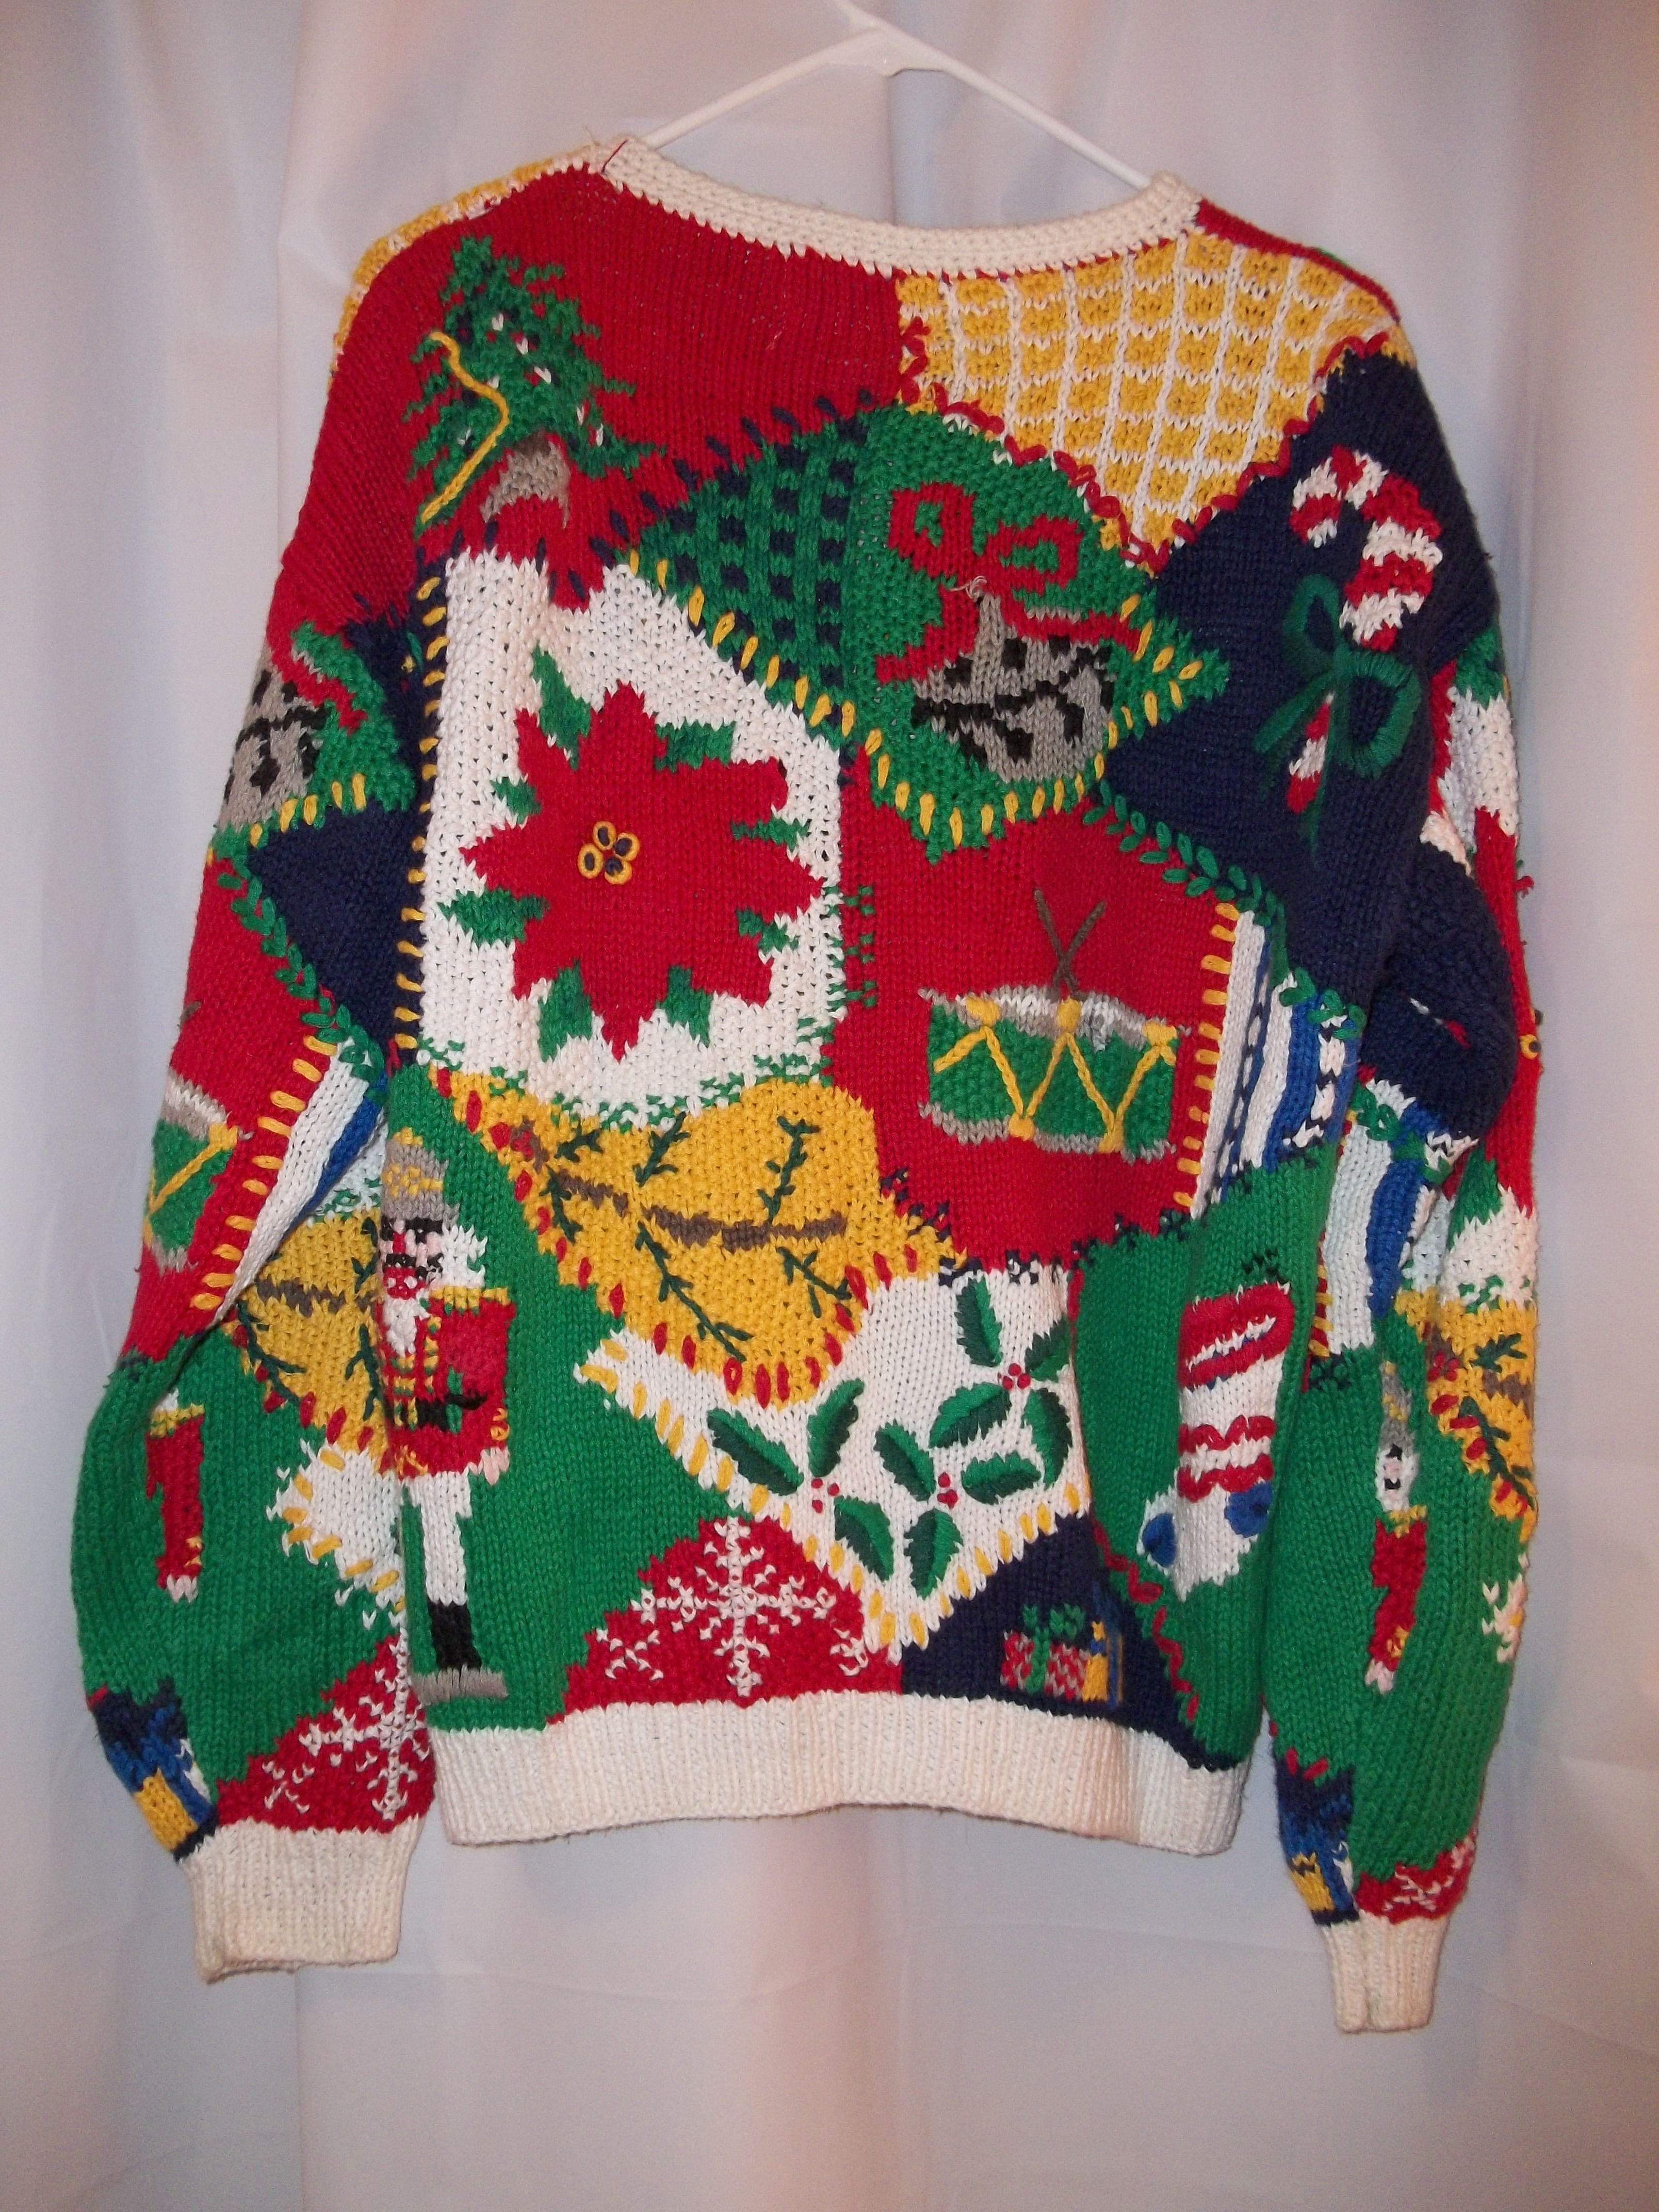 ugly christmas sweater huge selection storesebaycomsomthinspecl ugliest christmas sweaters - Ebay Ugly Christmas Sweater